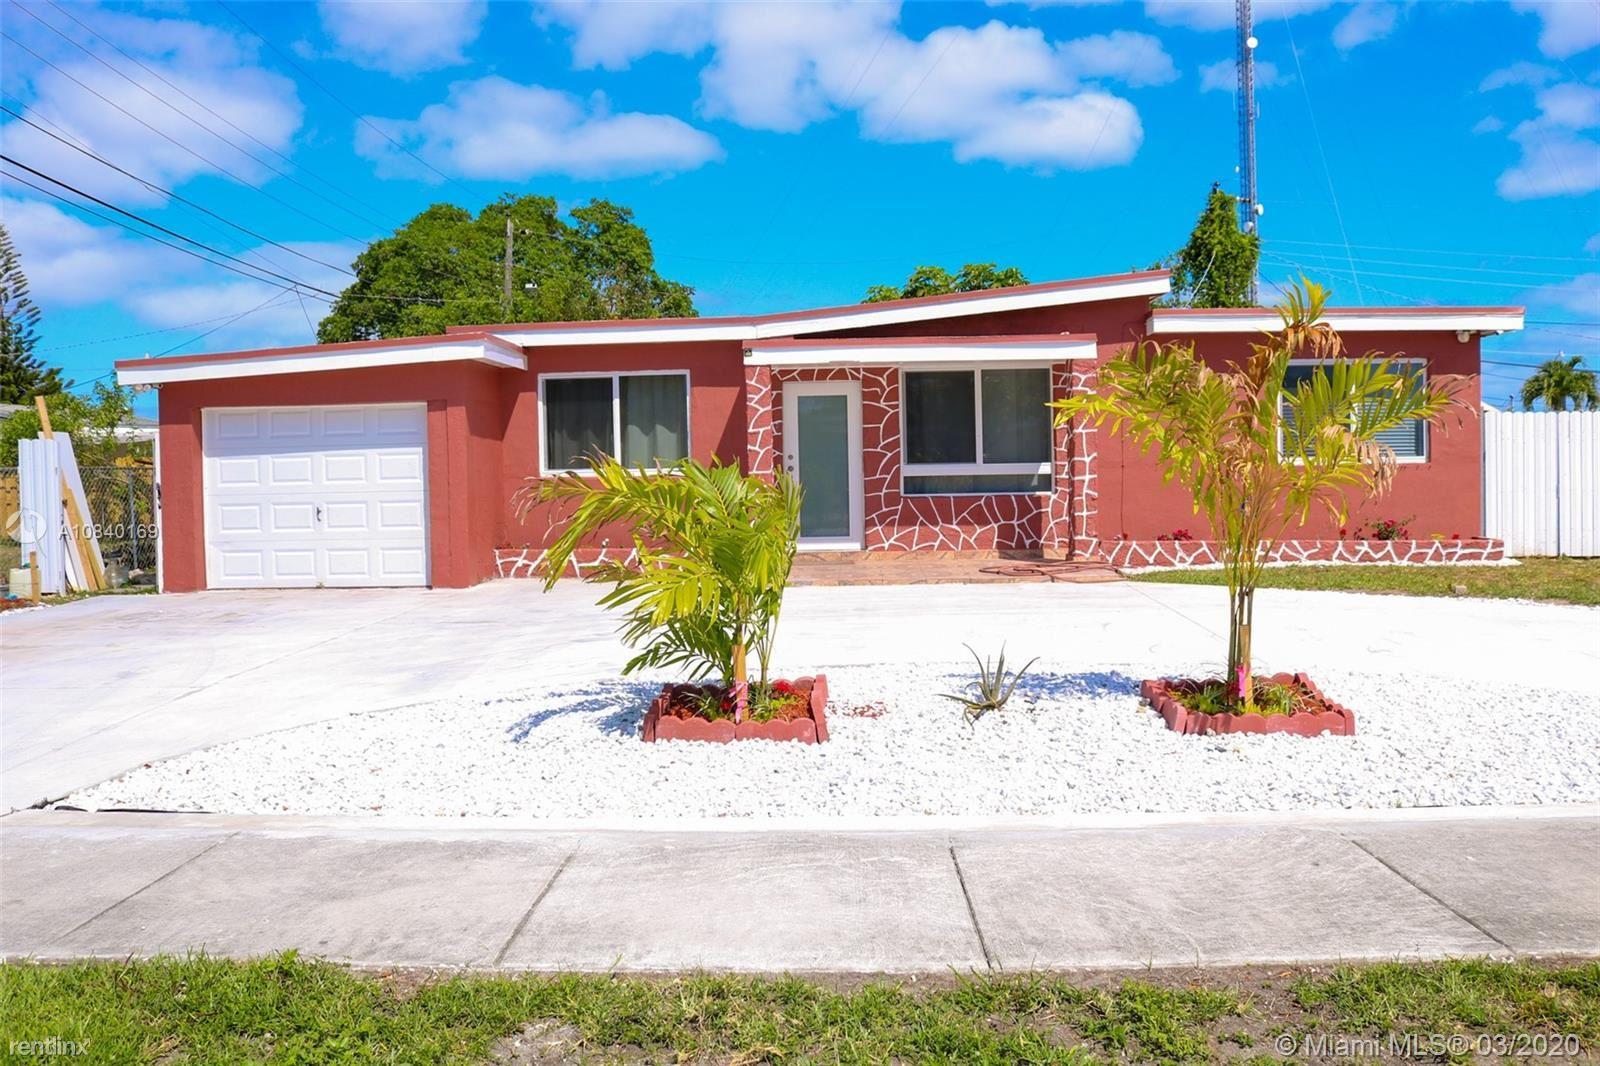 2541 SW 54th Ave, West Park, FL - $1,895